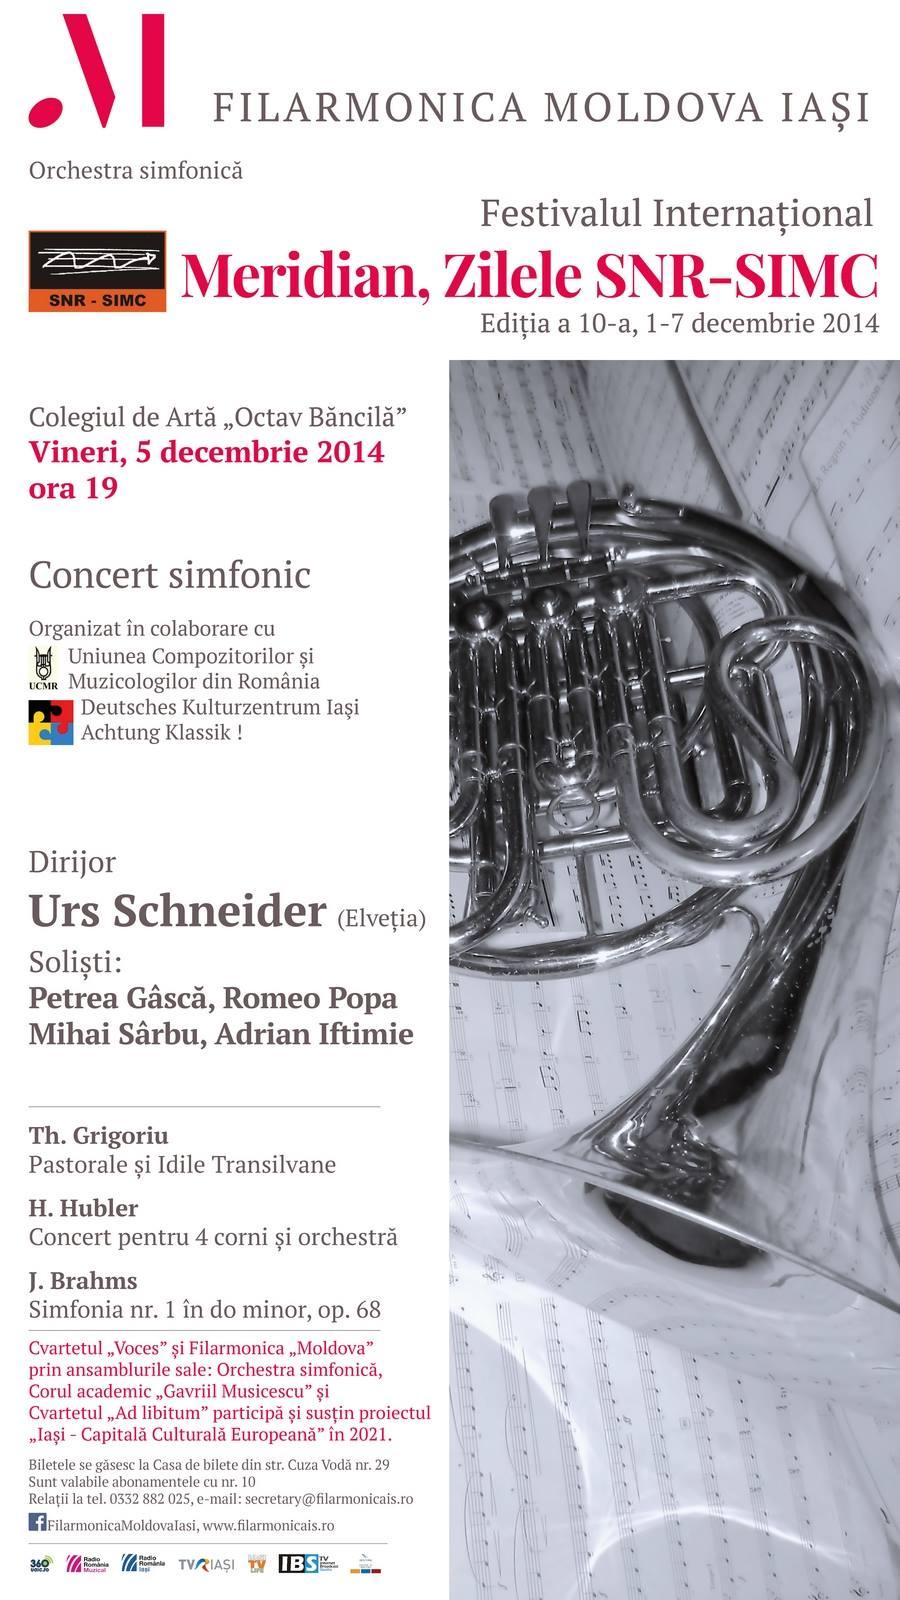 5 dec 14 Afis Filarmonica Moldova